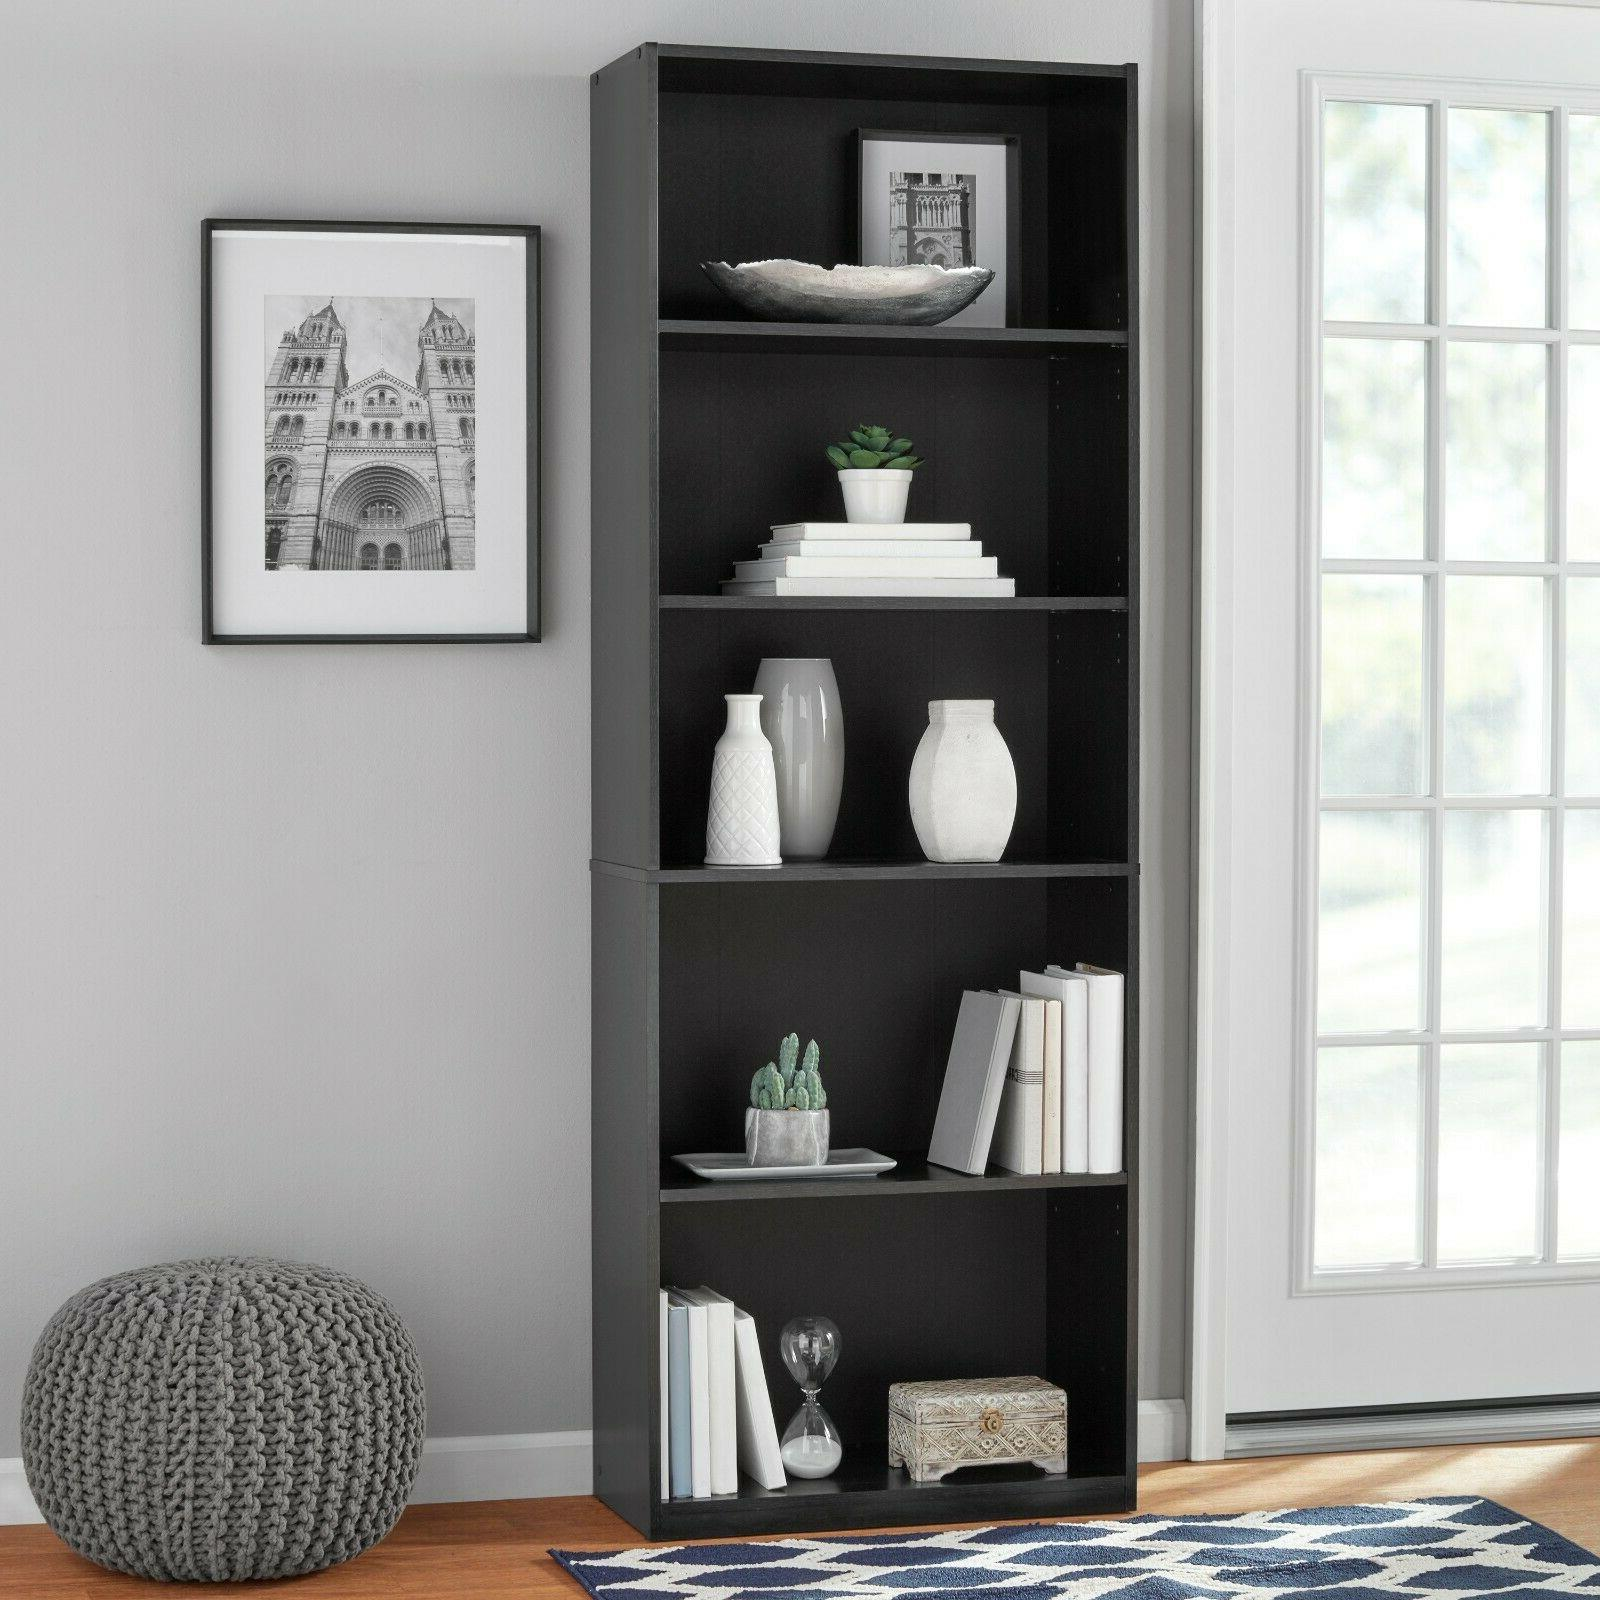 "71"" Tall 5-Shelf Closed Adjustable Bookshelf Storage Shelves"